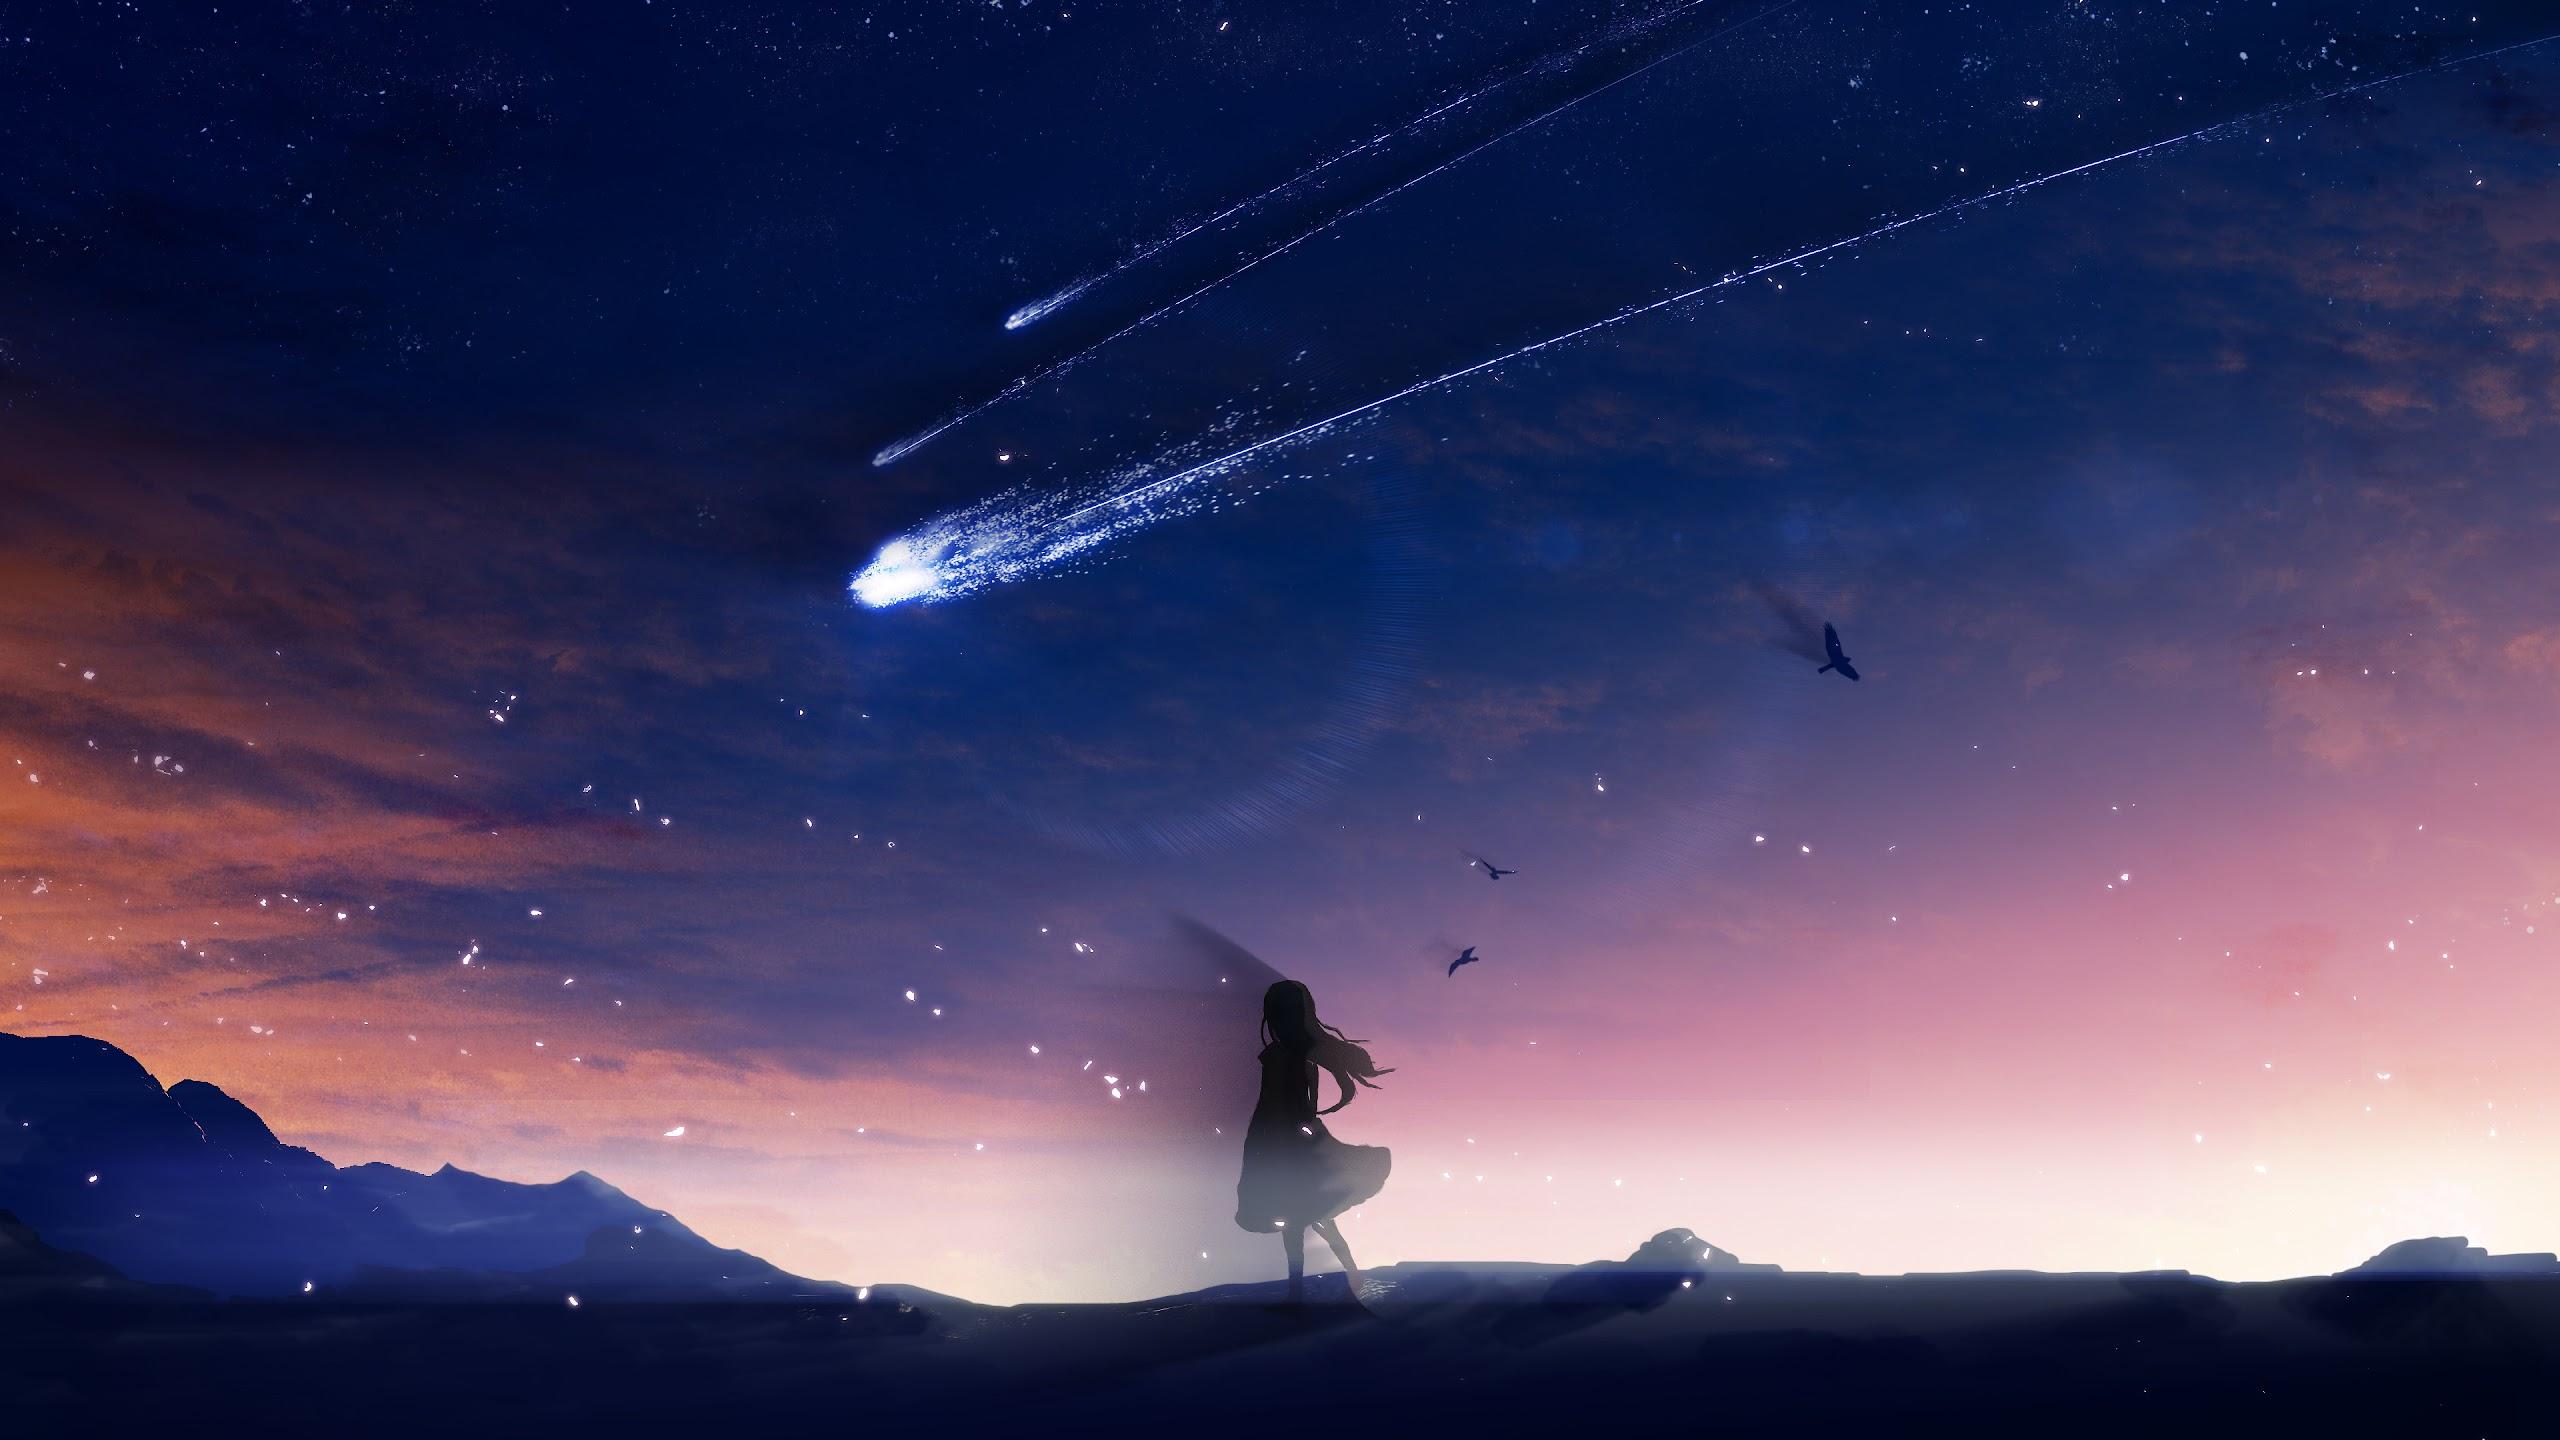 Anime Wallpaper Night Sky